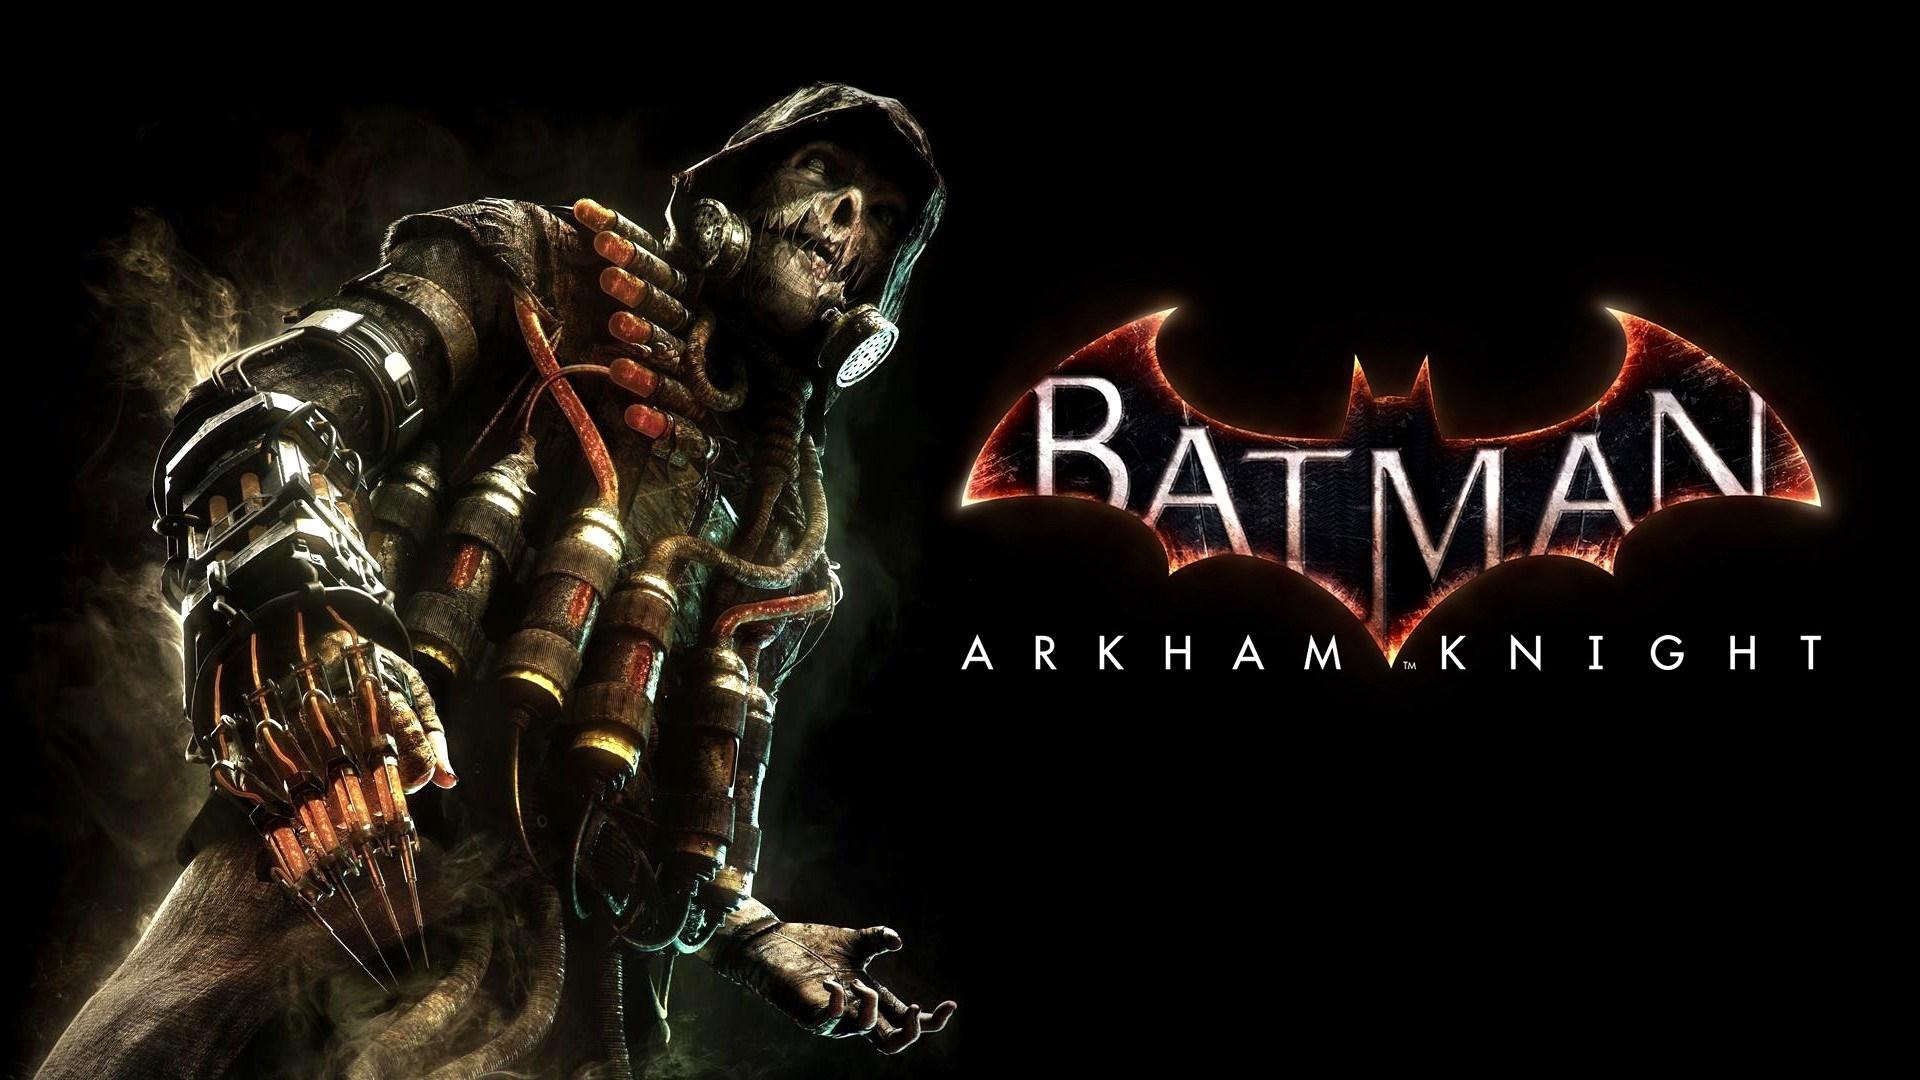 10 Latest Batman Arkham Knight Scarecrow Wallpaper Full Hd 1080p For